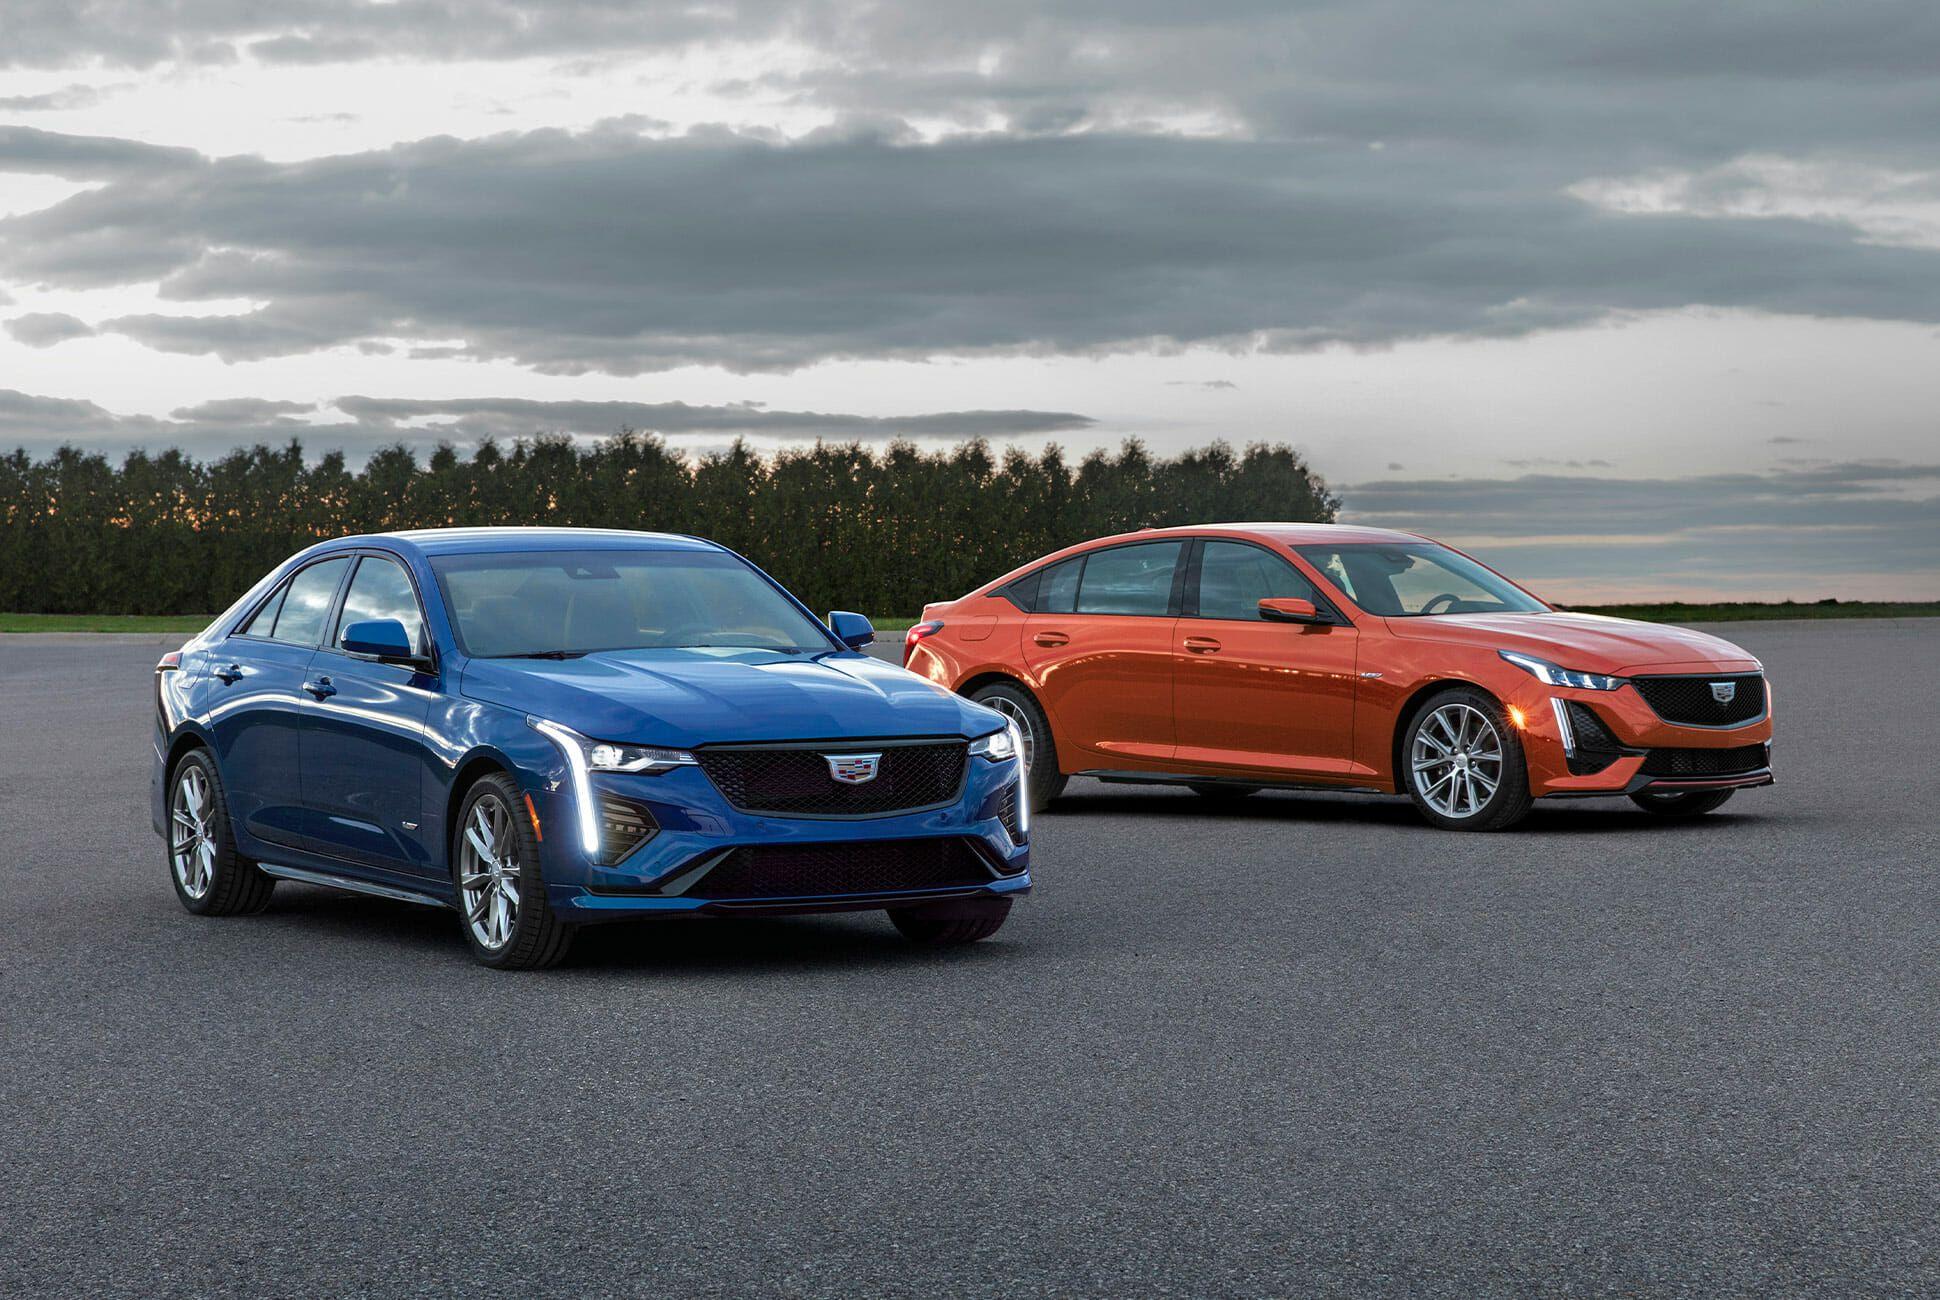 Cadillac-CT4-V-and-CT5-V-Gear-Patrol-lead-full